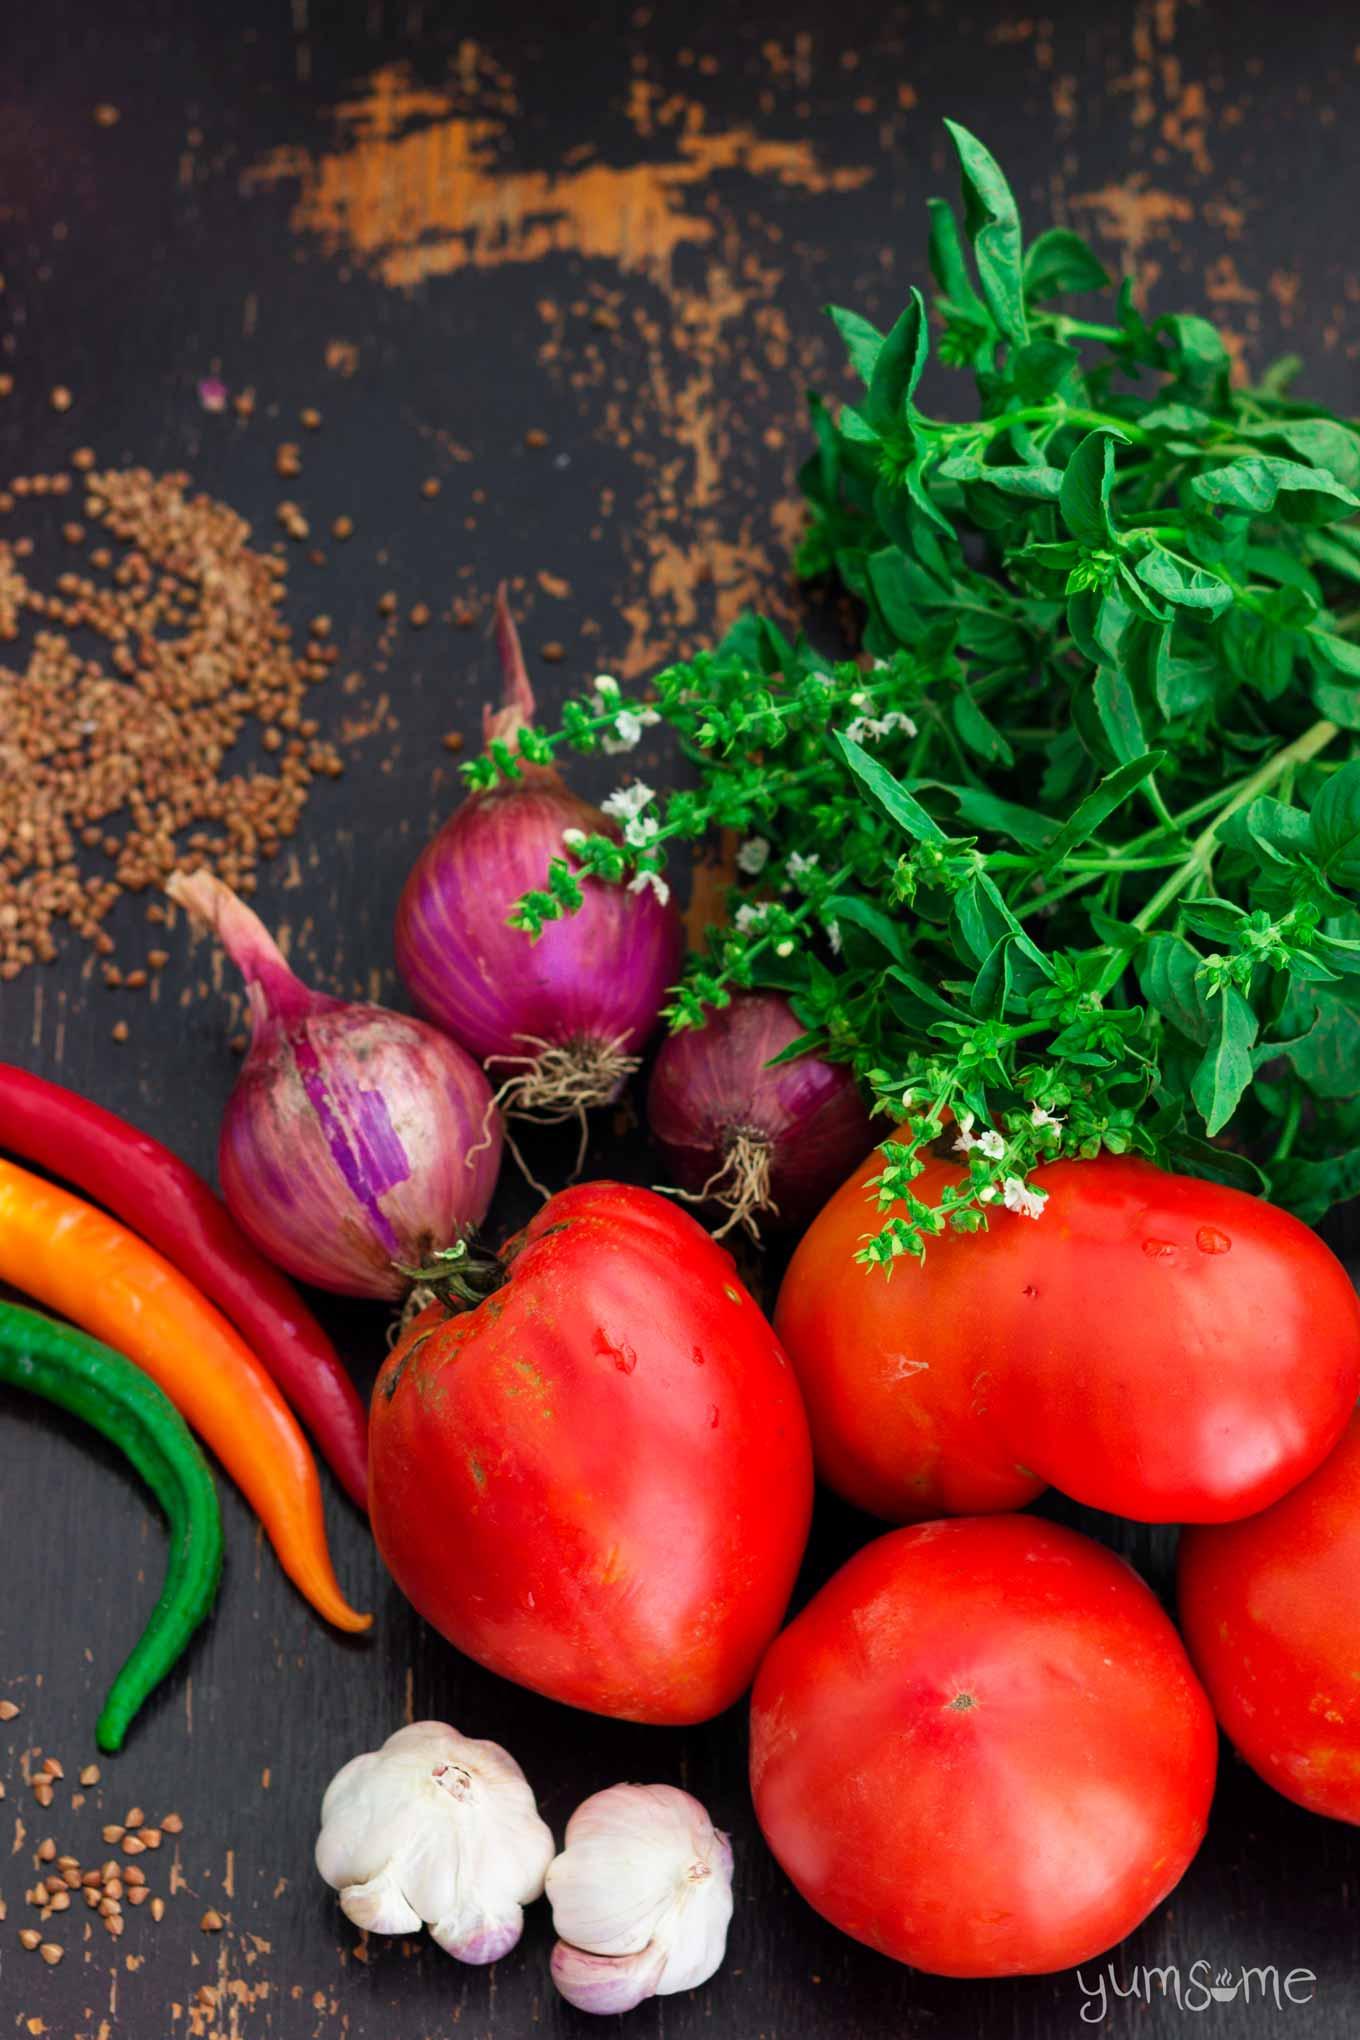 tomatoes, chillies, basil, garlic, onions | yumsome.com